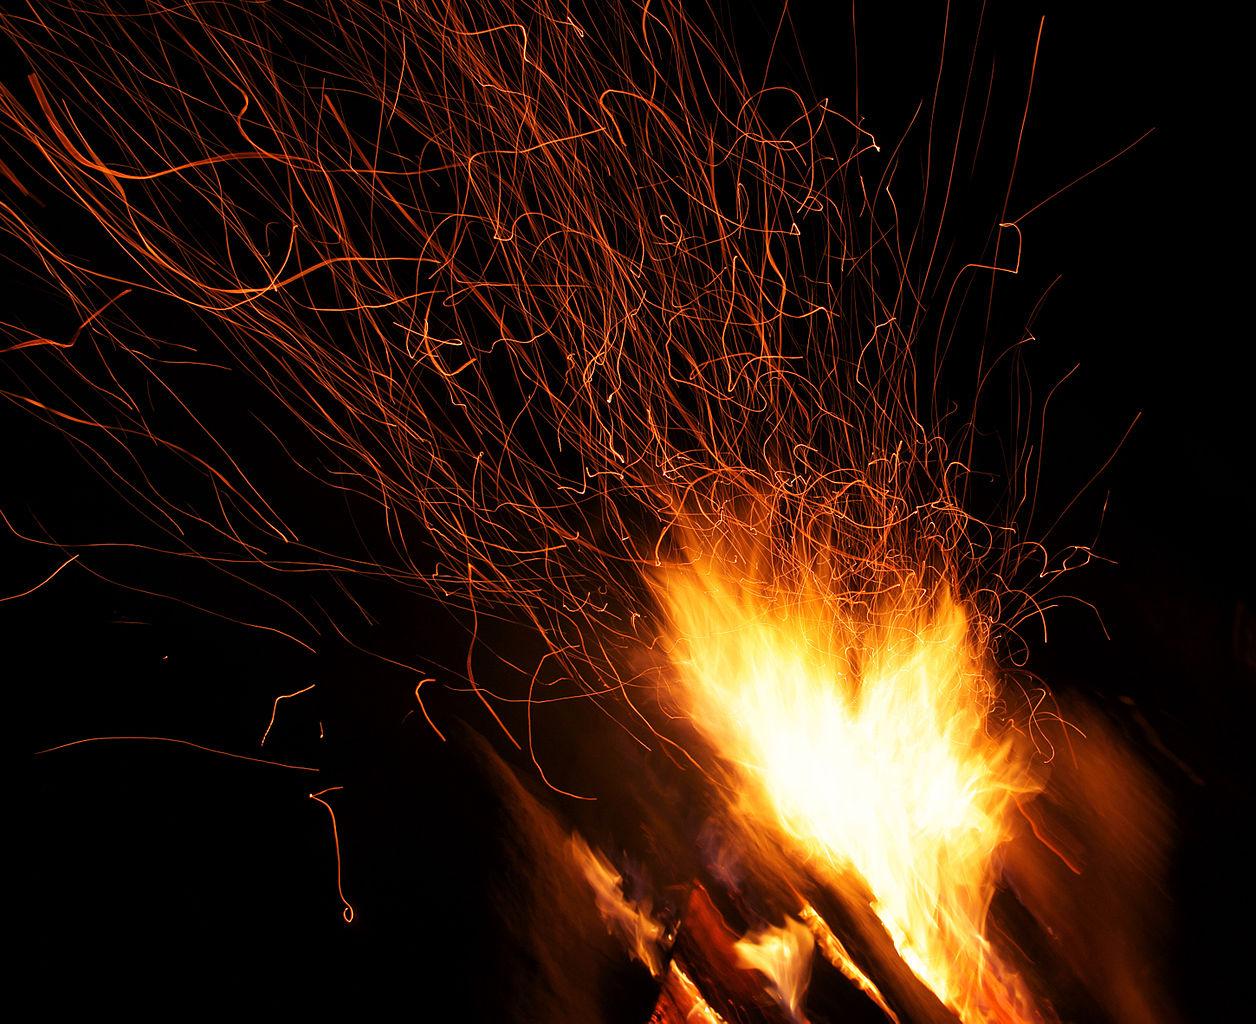 Uplifting the Fallen Sparks – Chanukah 2014